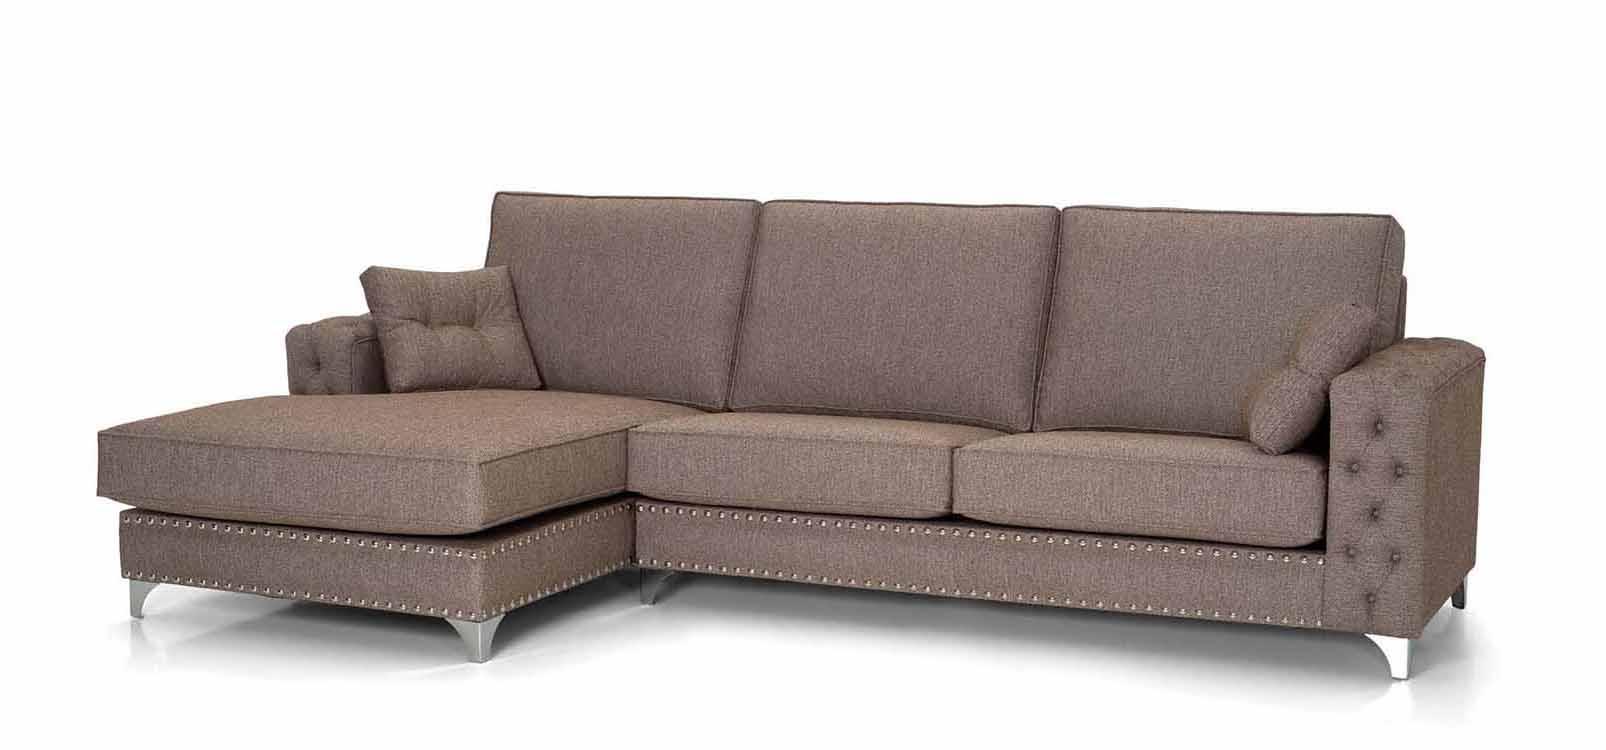 Ofertas de sof s en madrid for Ofertas sofas madrid